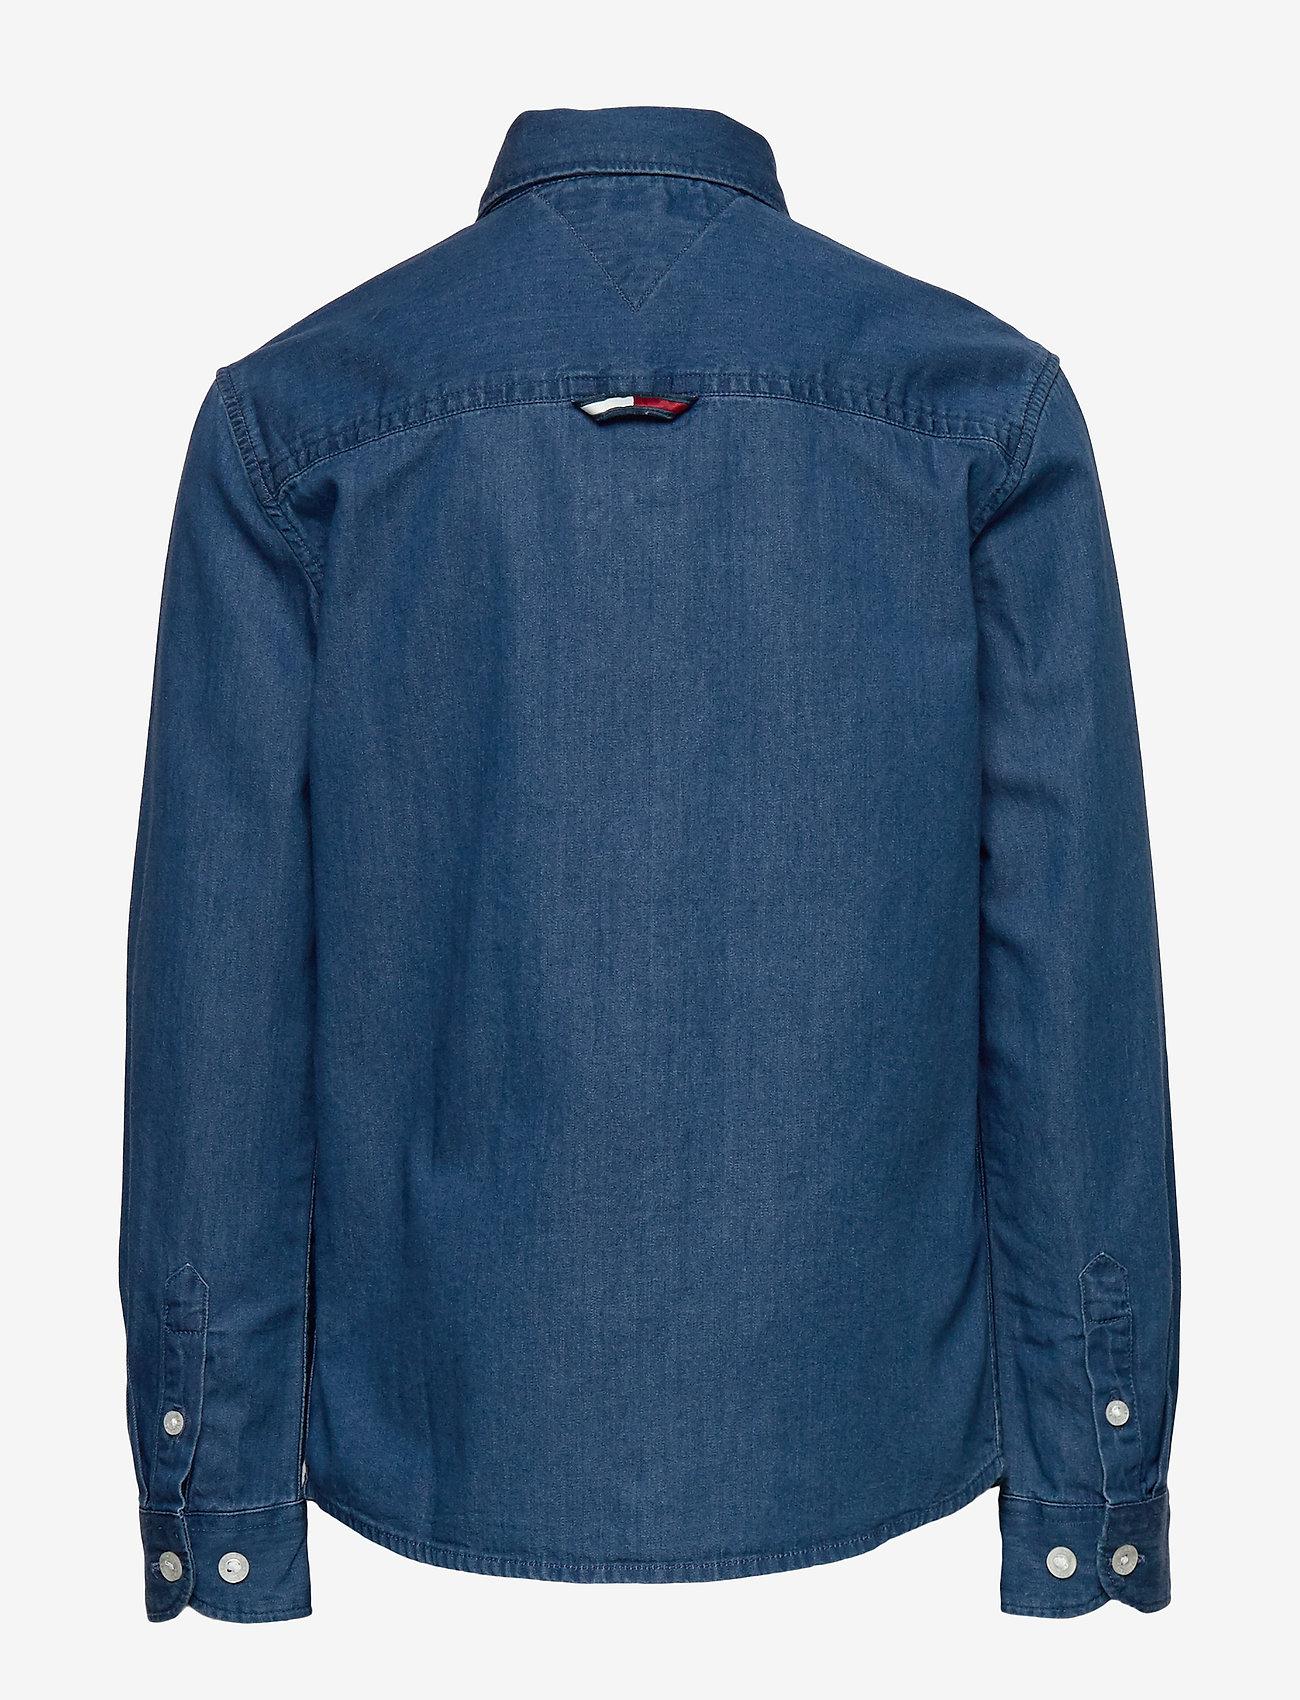 Tommy Hilfiger - DENIM SHIRT L/S - shirts - denim dark 01 - 1